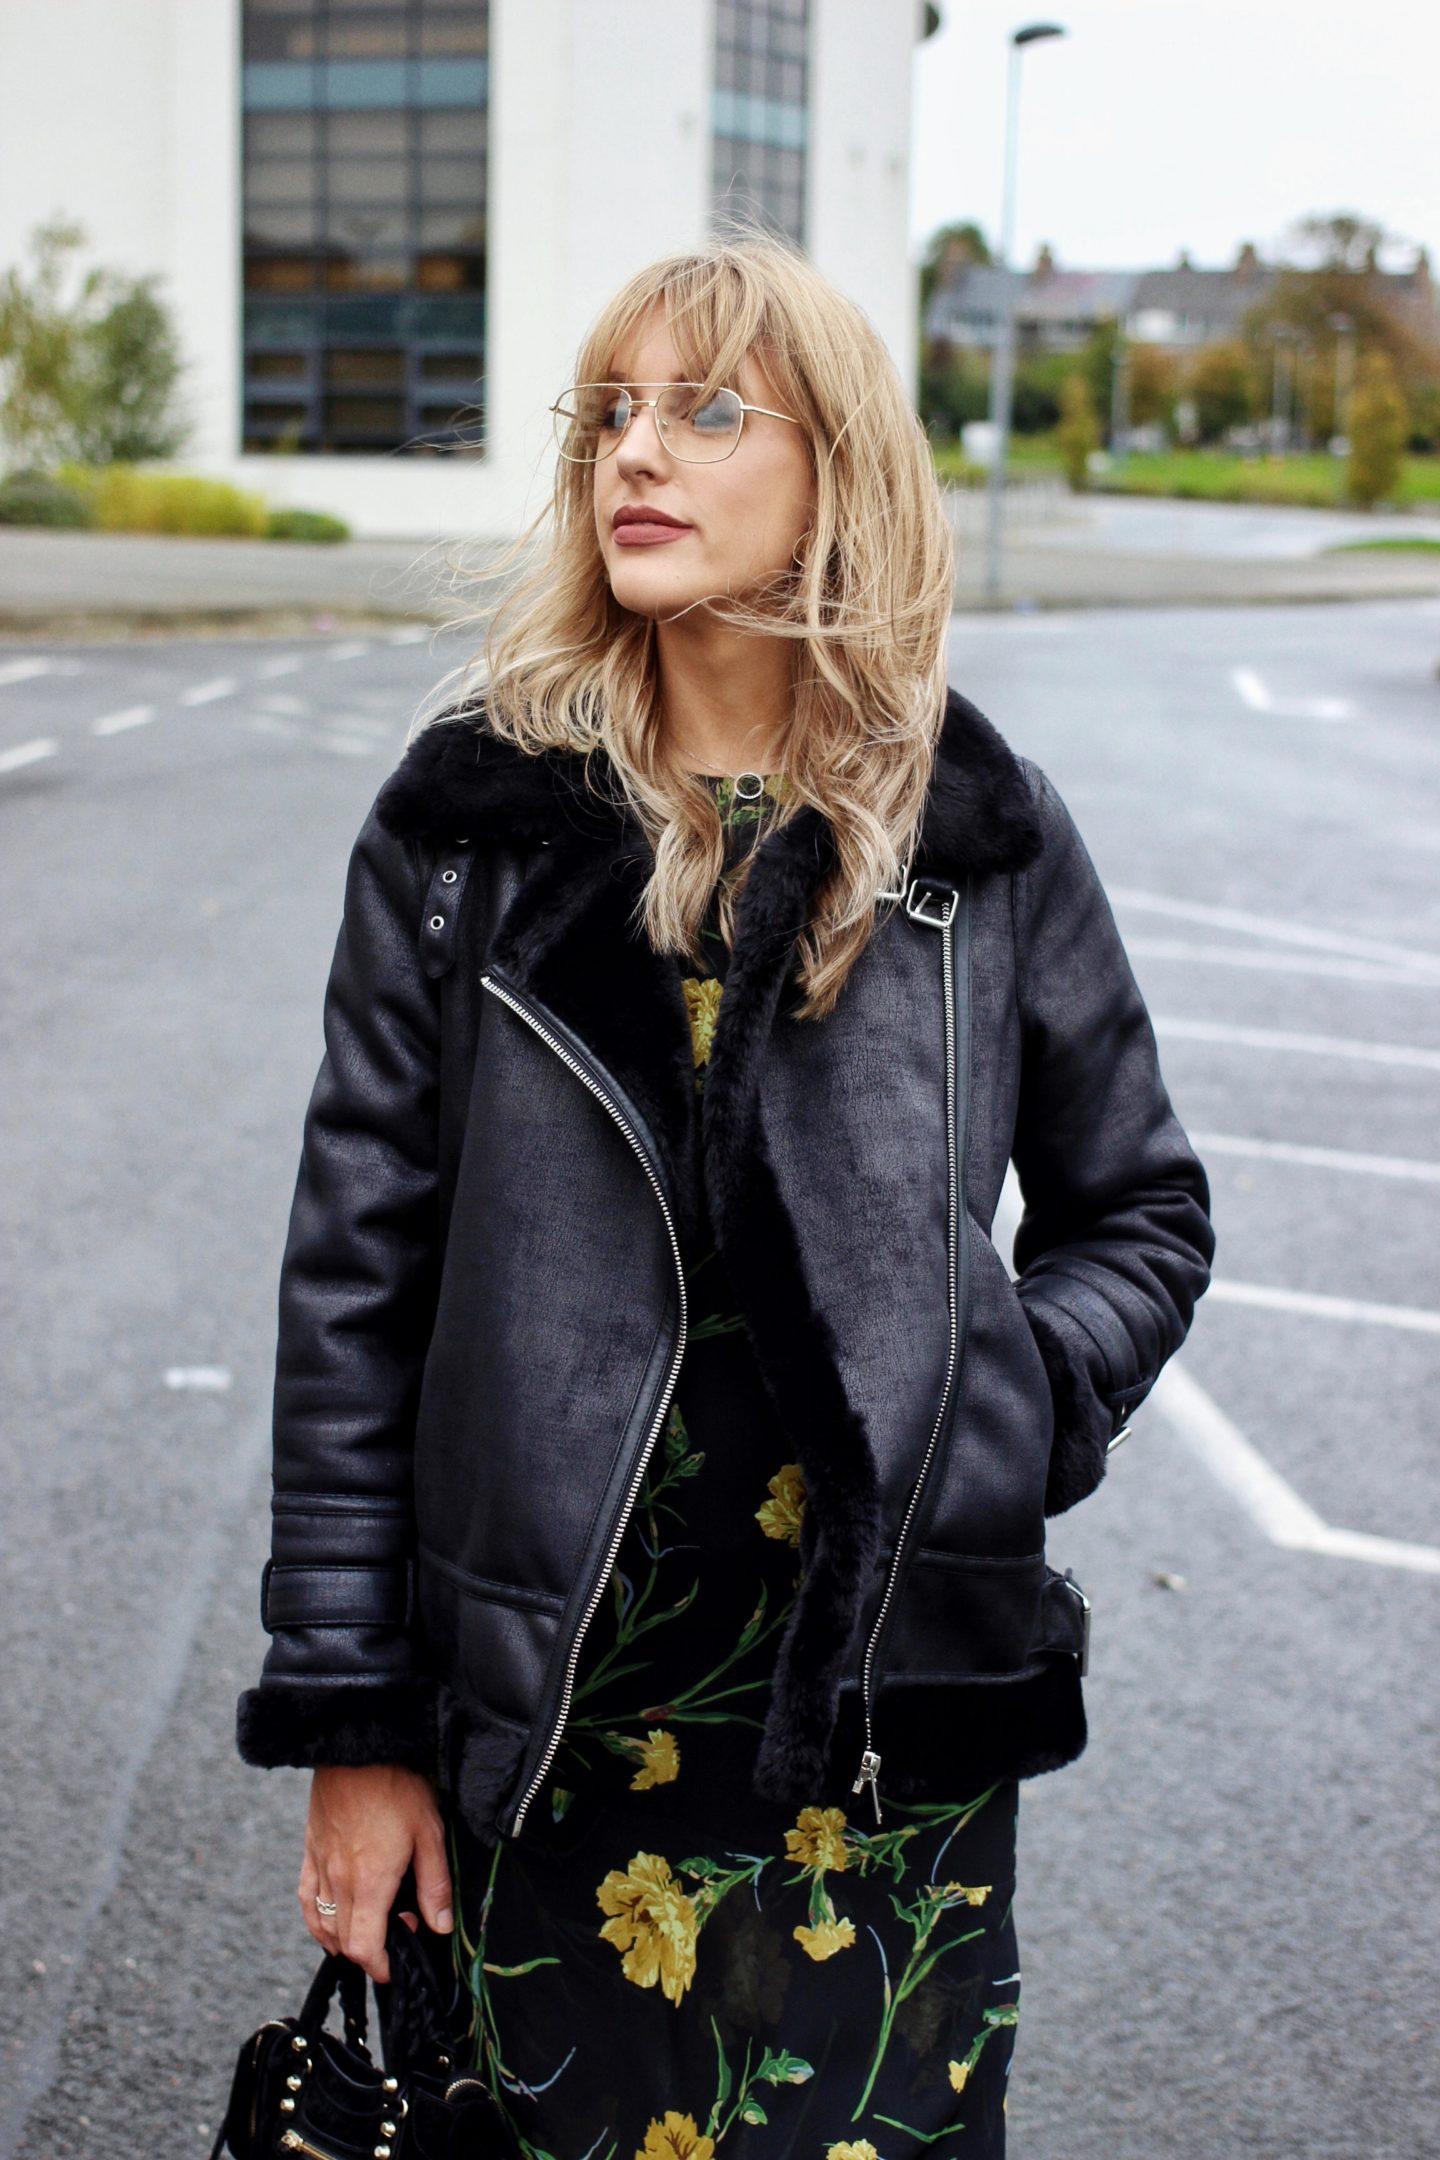 high street style blogger Charlotte Buttrick in Warehouse oversized biker jacket